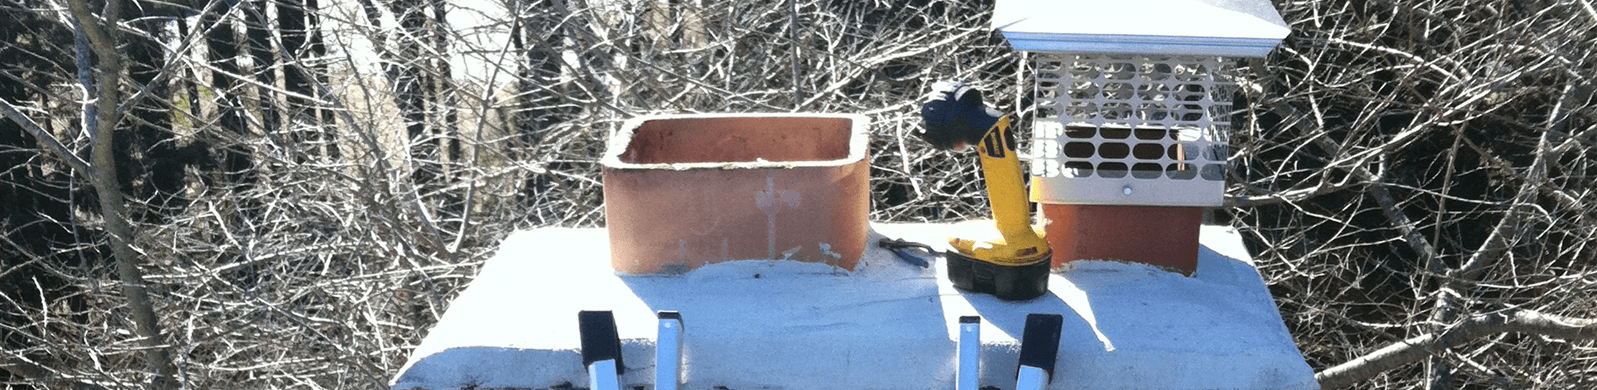 Chimney Sweep Northern Va Chimney Cleaning Repair